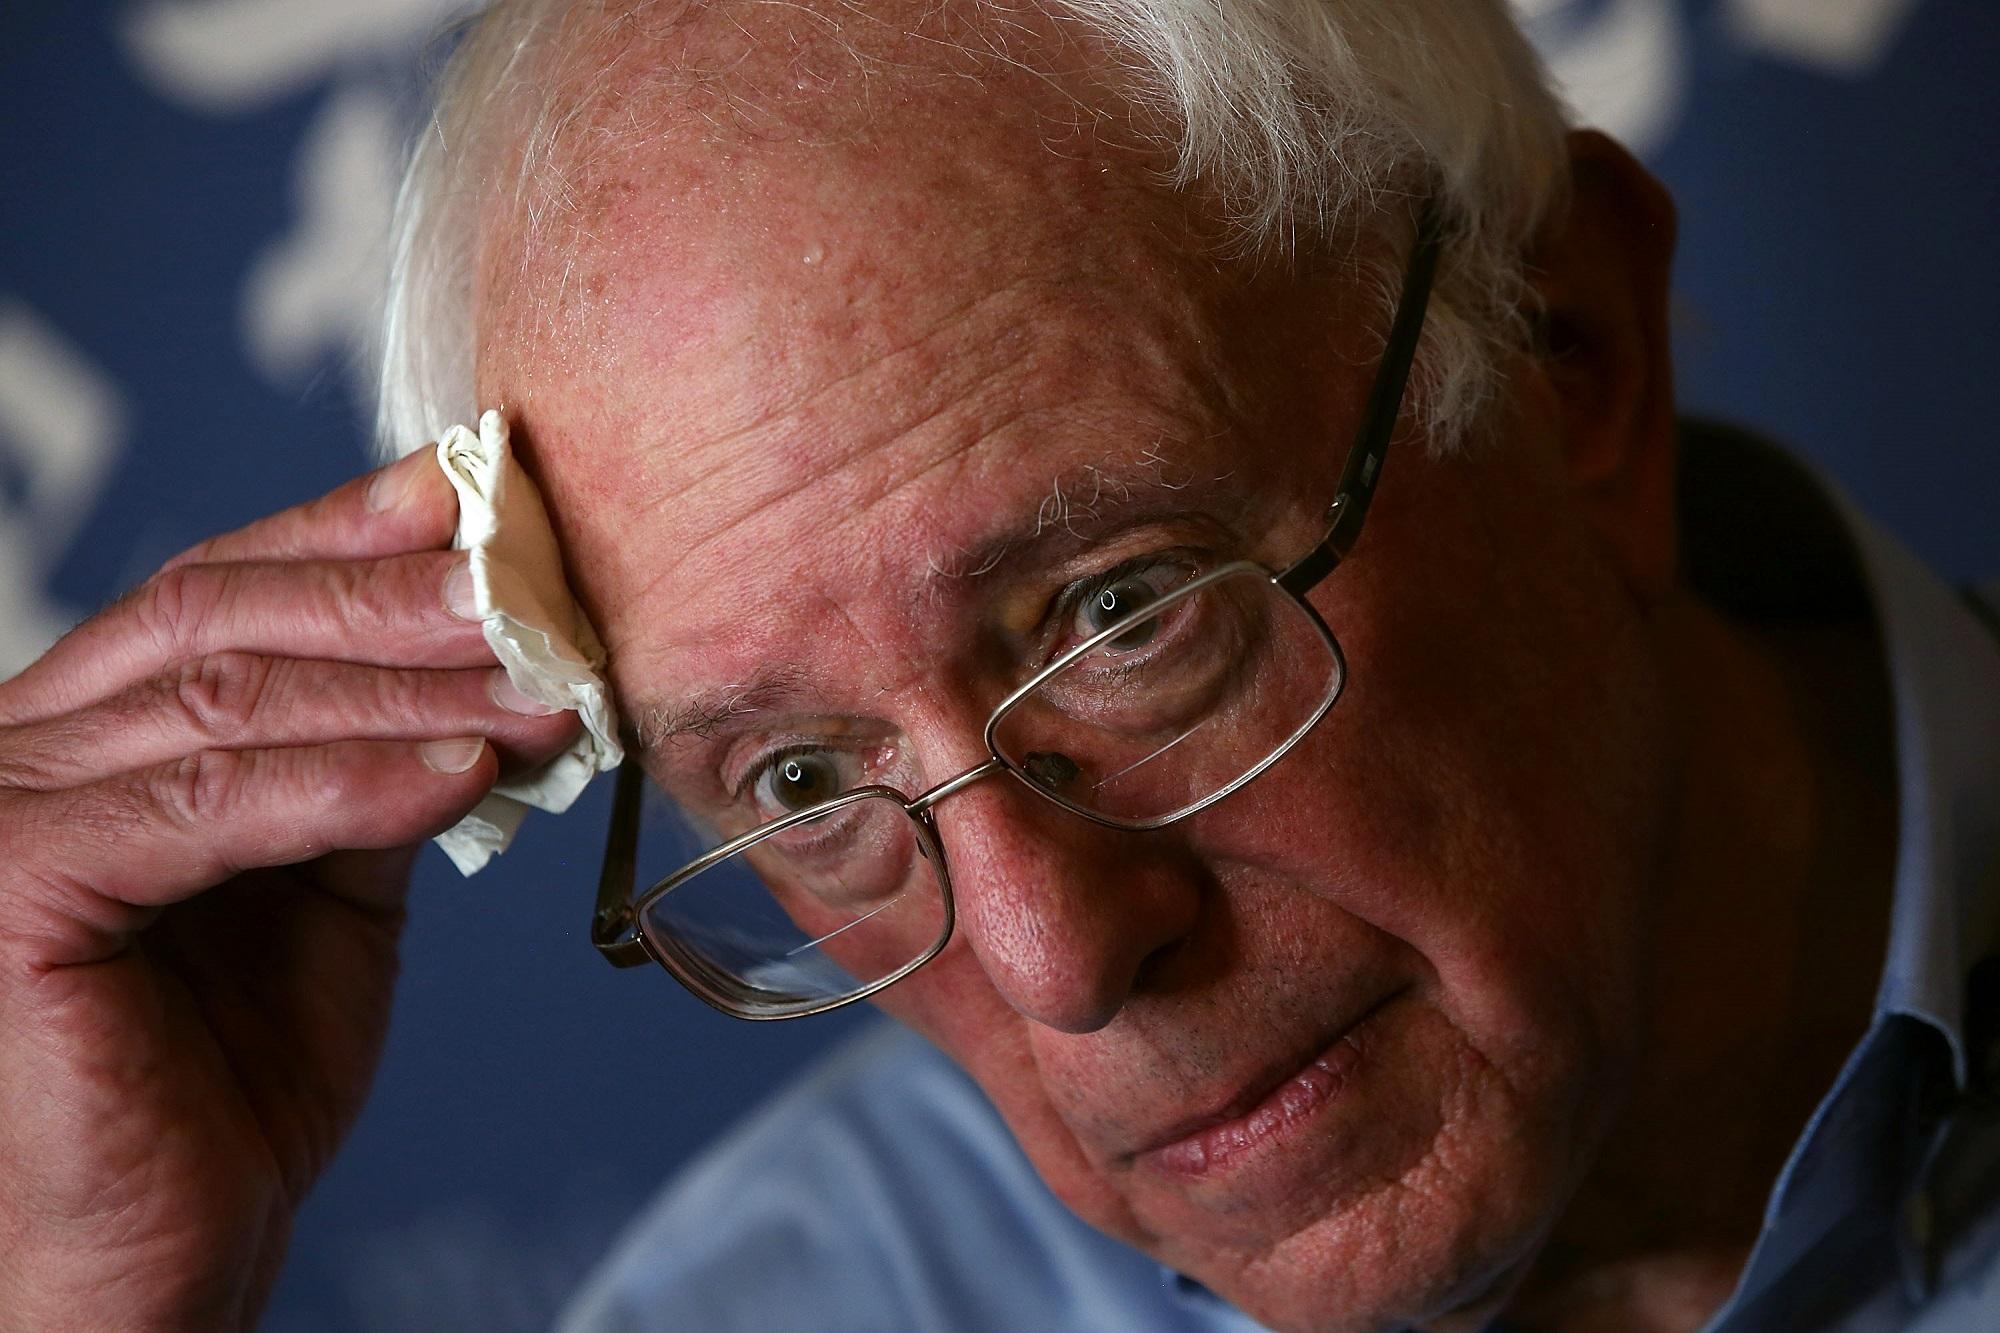 Bernie Sanders Getty Images/Justin Sullivan